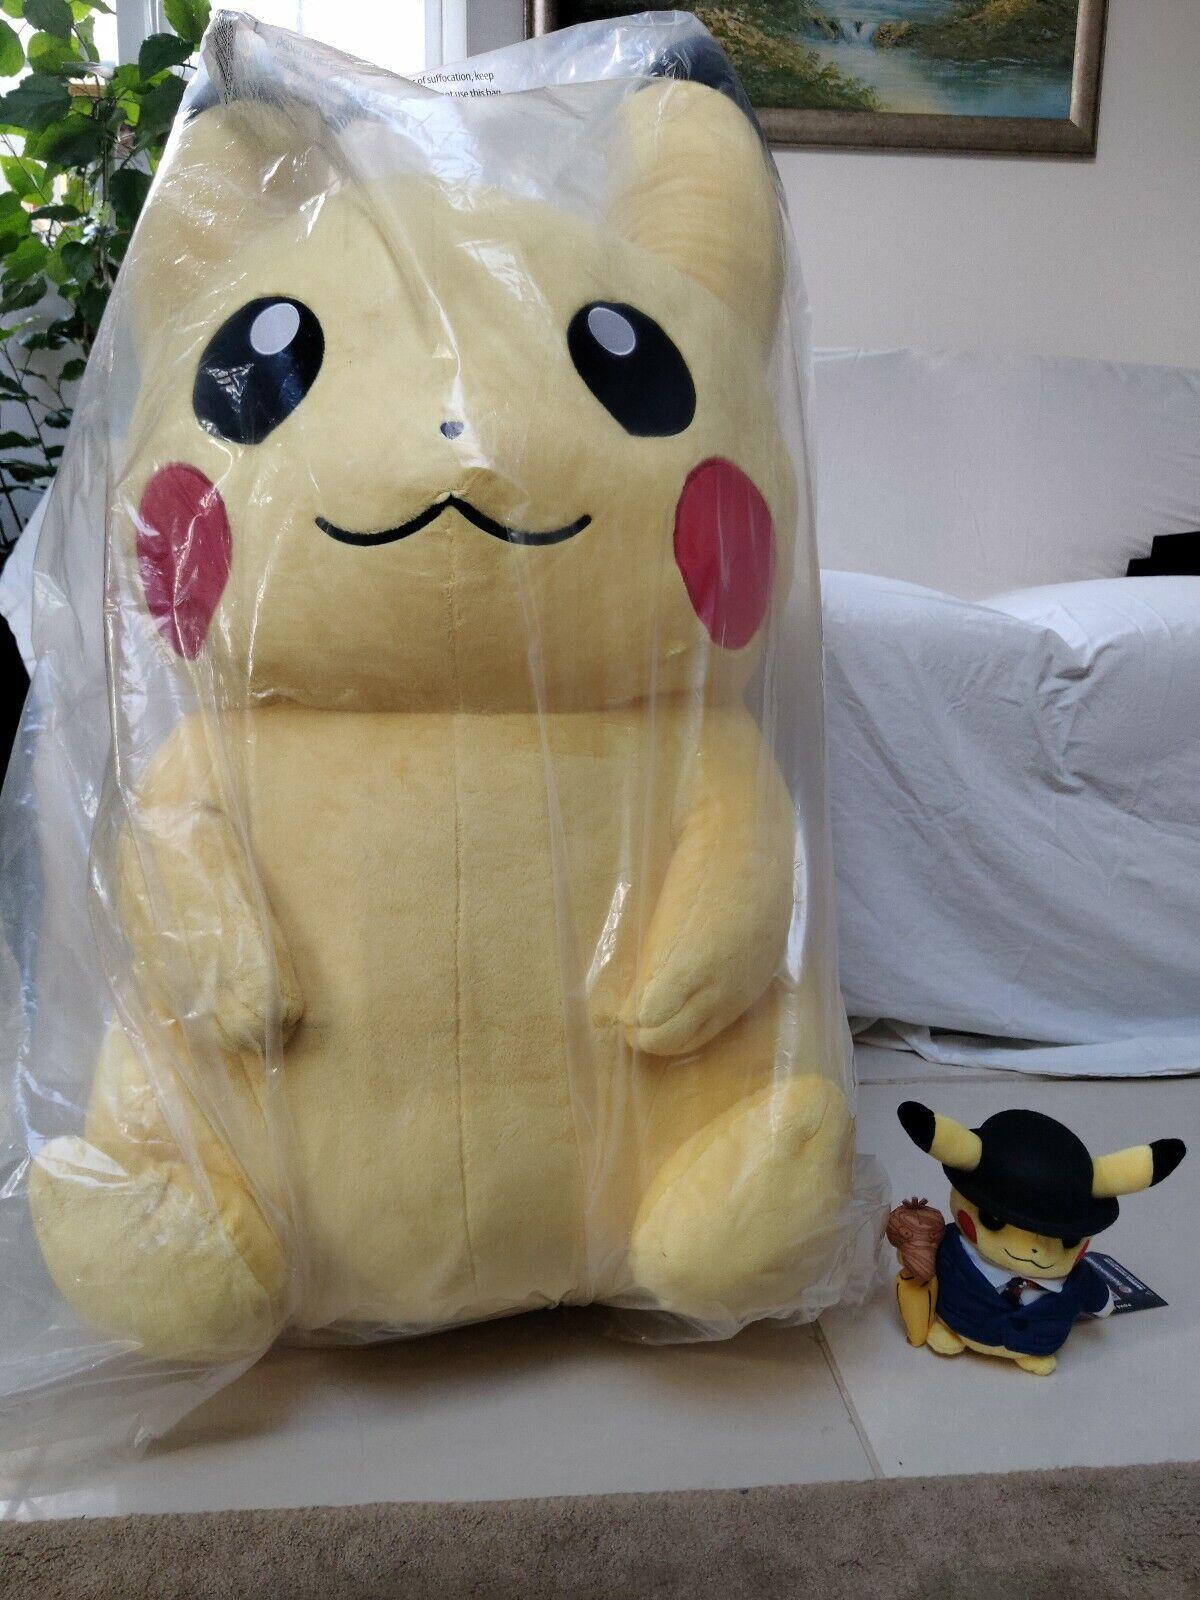 Officiell Pok lila 65533;Mon Center London - Pok 65533;65533;; Plush mbo Pikachu